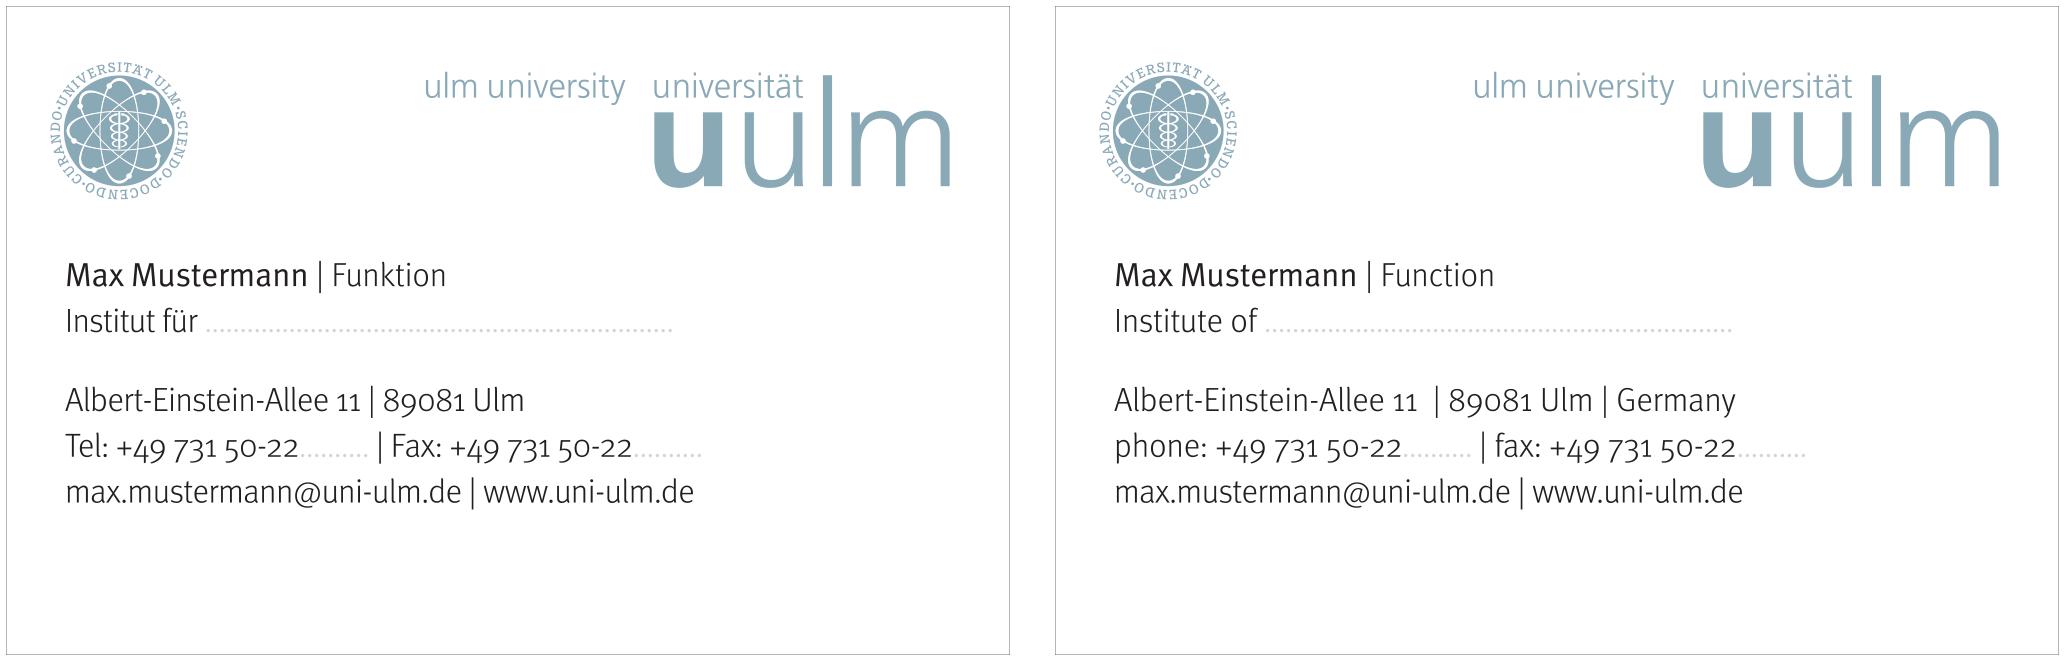 Visitenkarten Universität Ulm